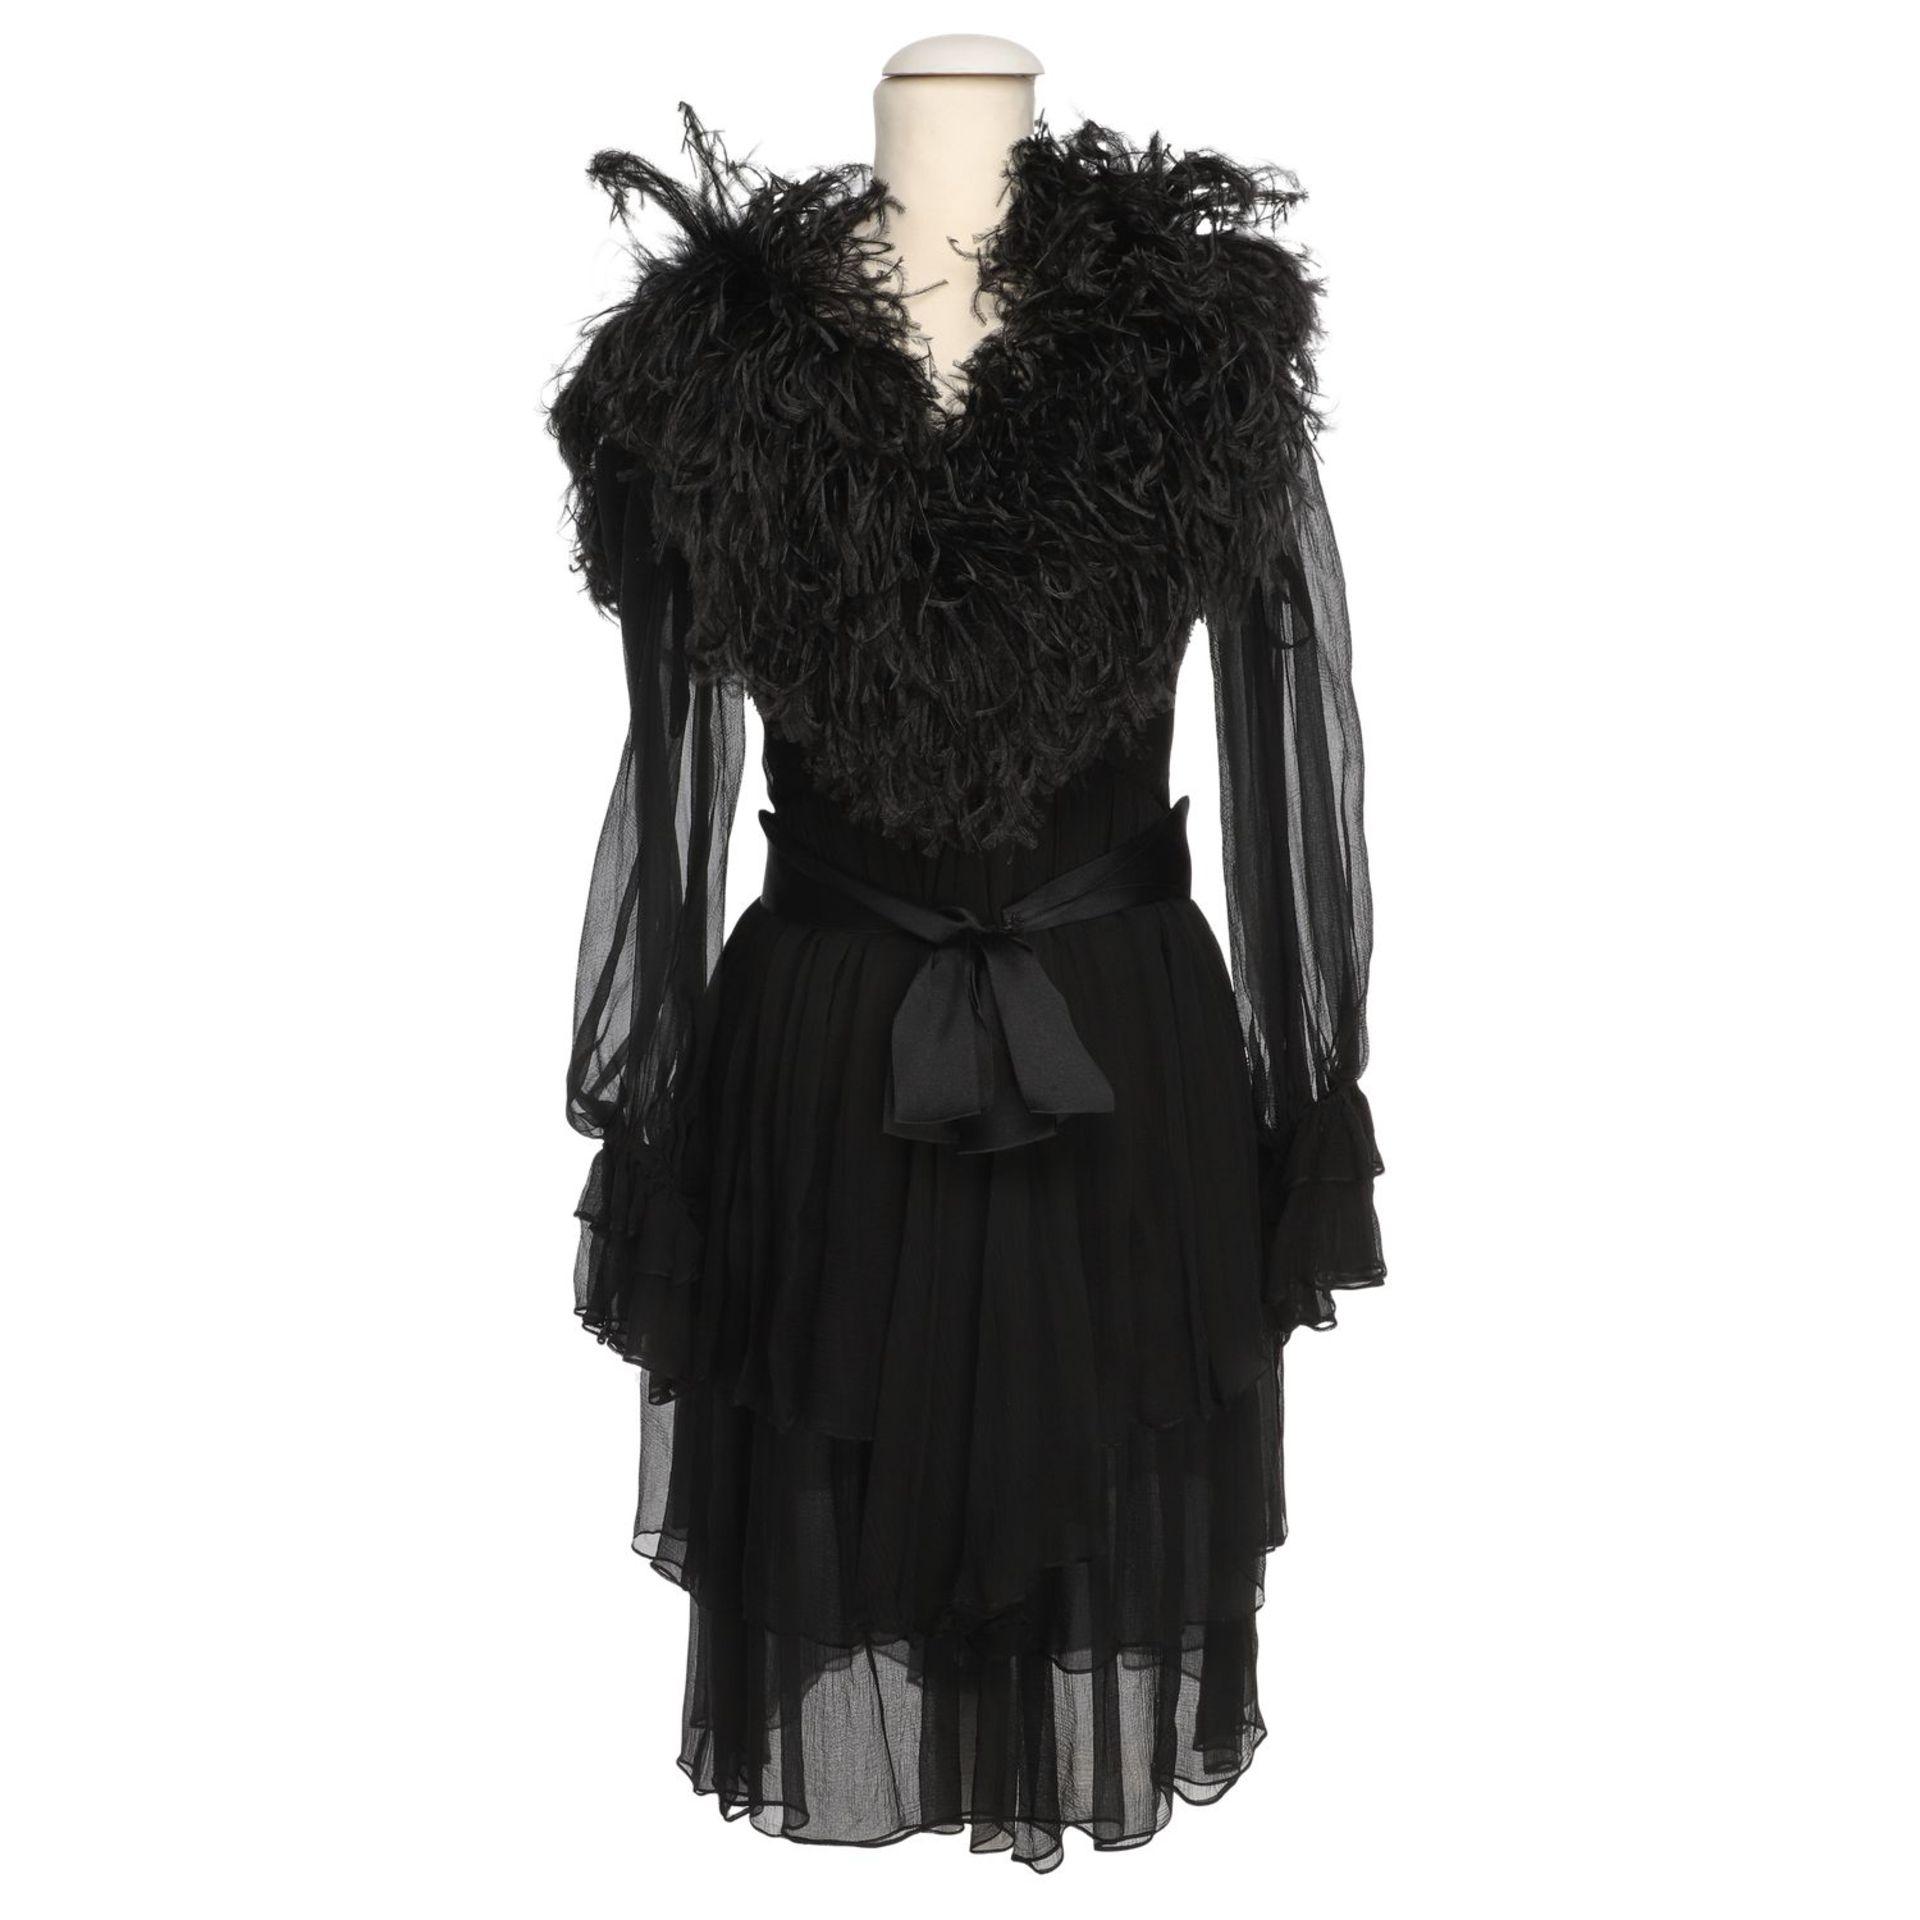 YVES SAINT LAURENT VINTAGE Kleid, Herstellergröße 36.